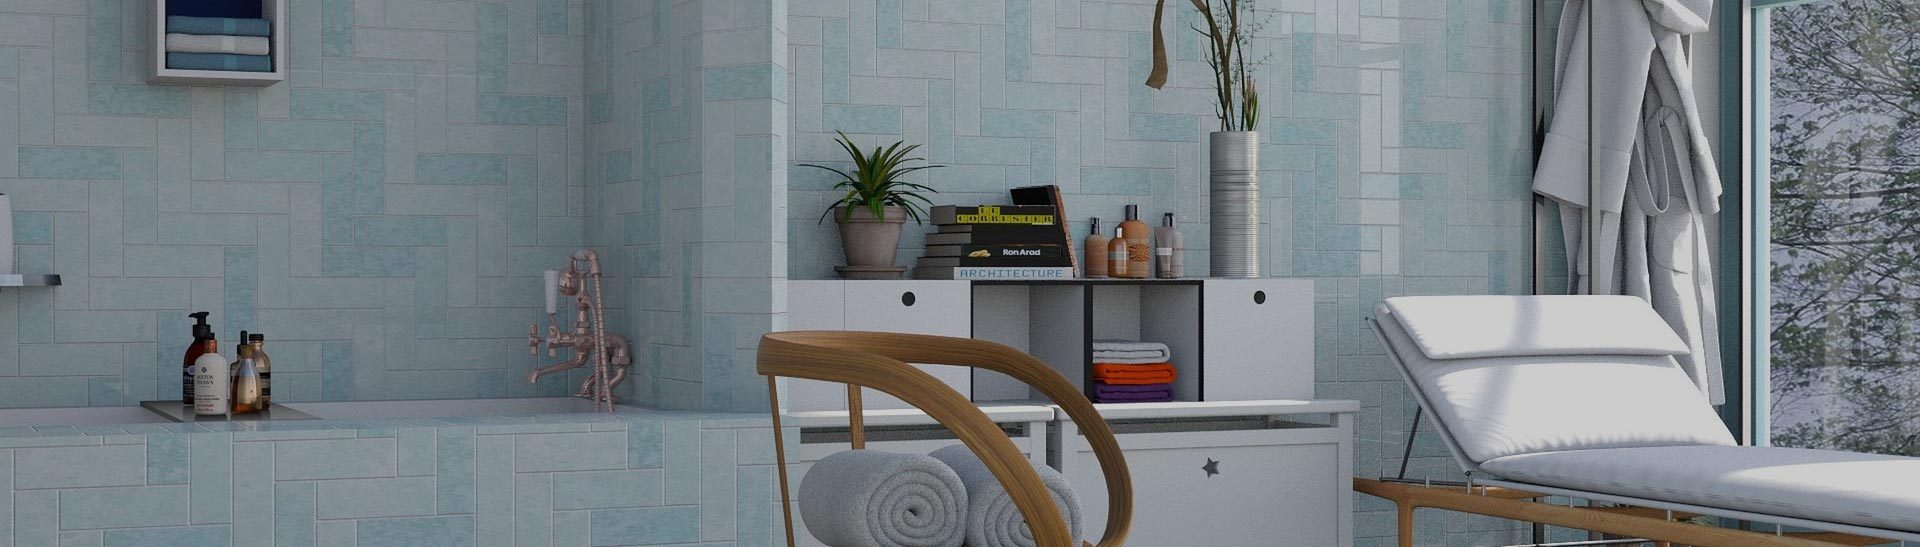 Salle De Bain Montpellier rénovation salle de bain montpellier - rfpc robert fabien